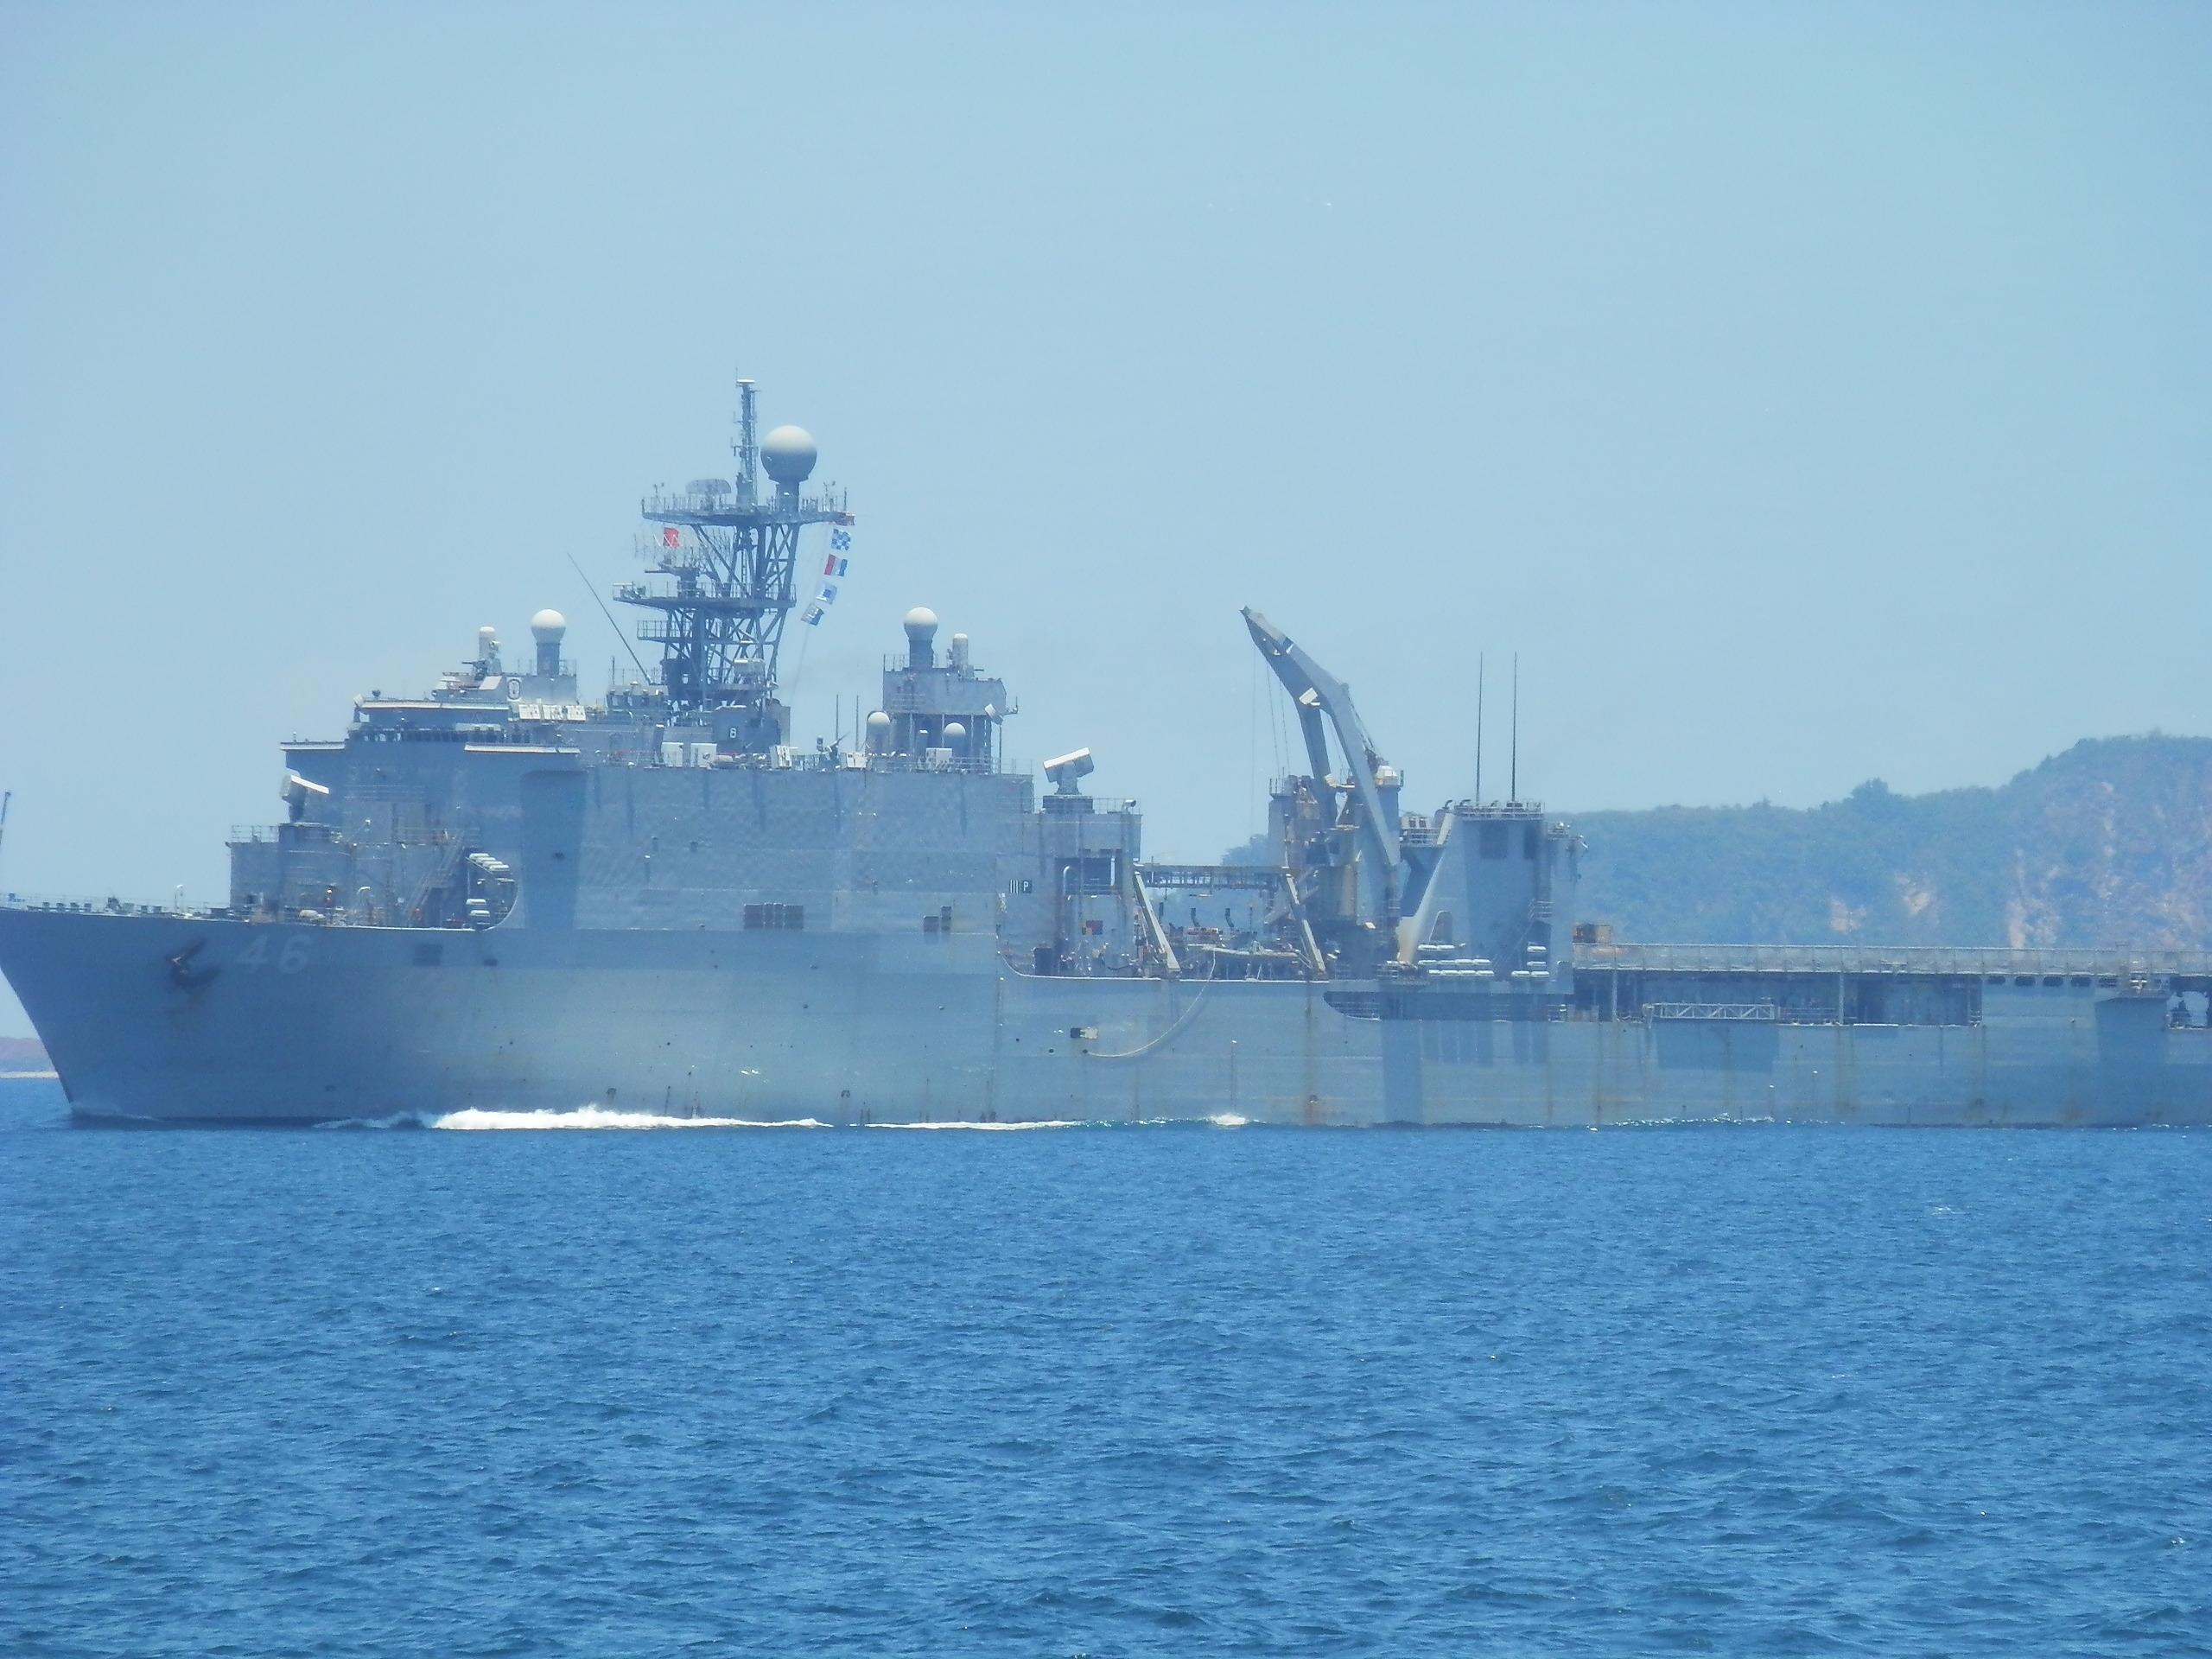 Ship at sea, Blue, Industrial, Sea, Ship, HQ Photo